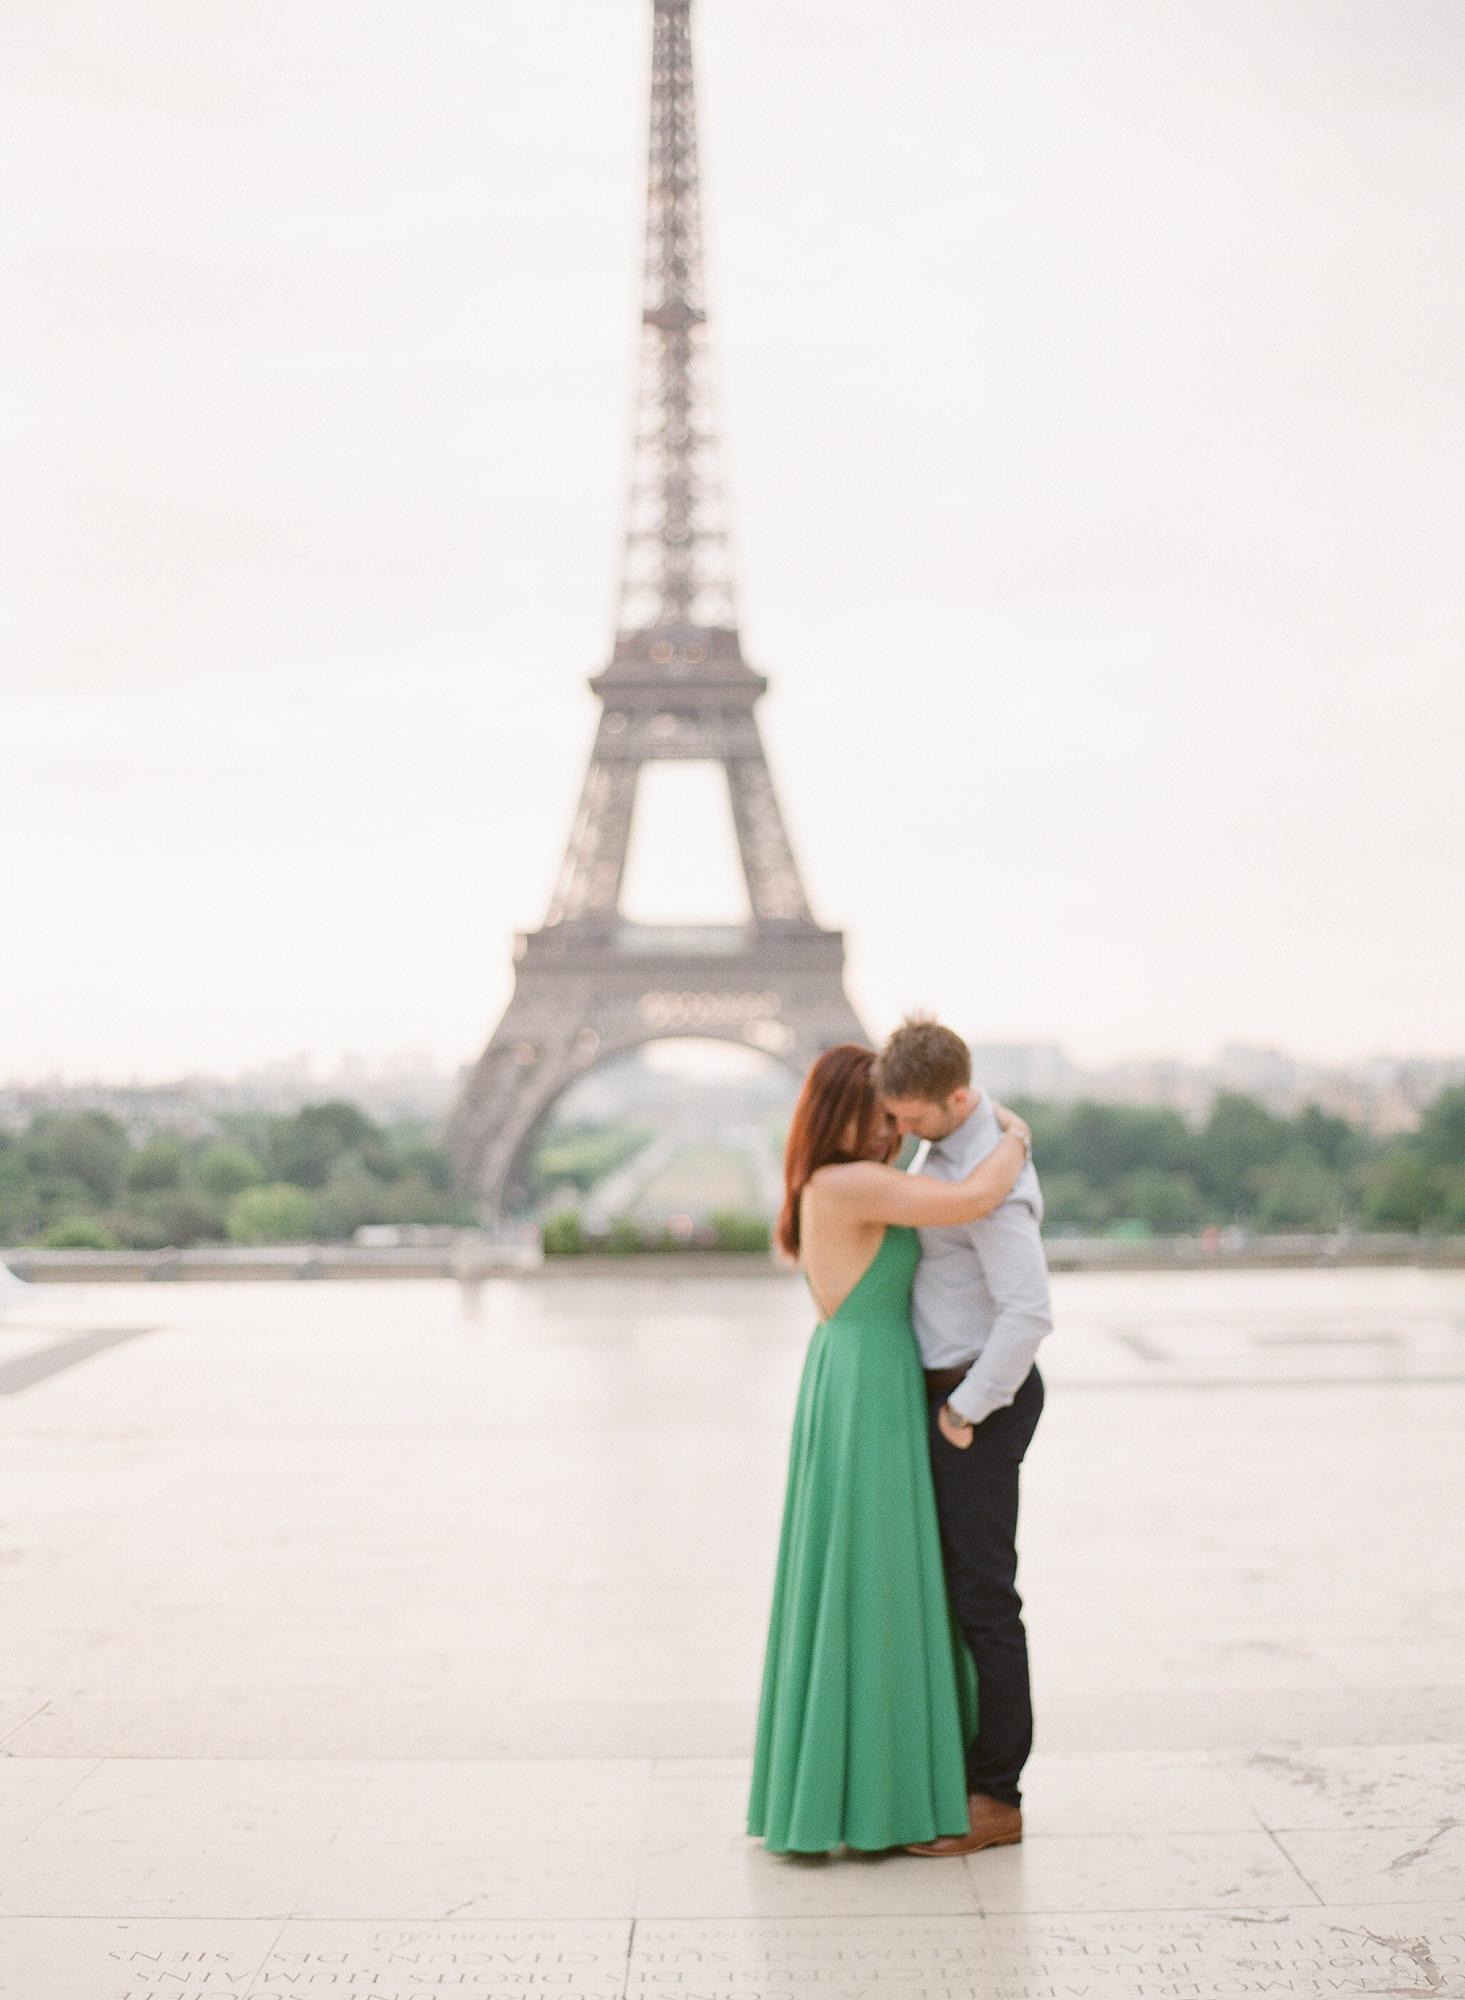 engagement-session-paris-wedding-alainm-photographer-58 (1).jpg